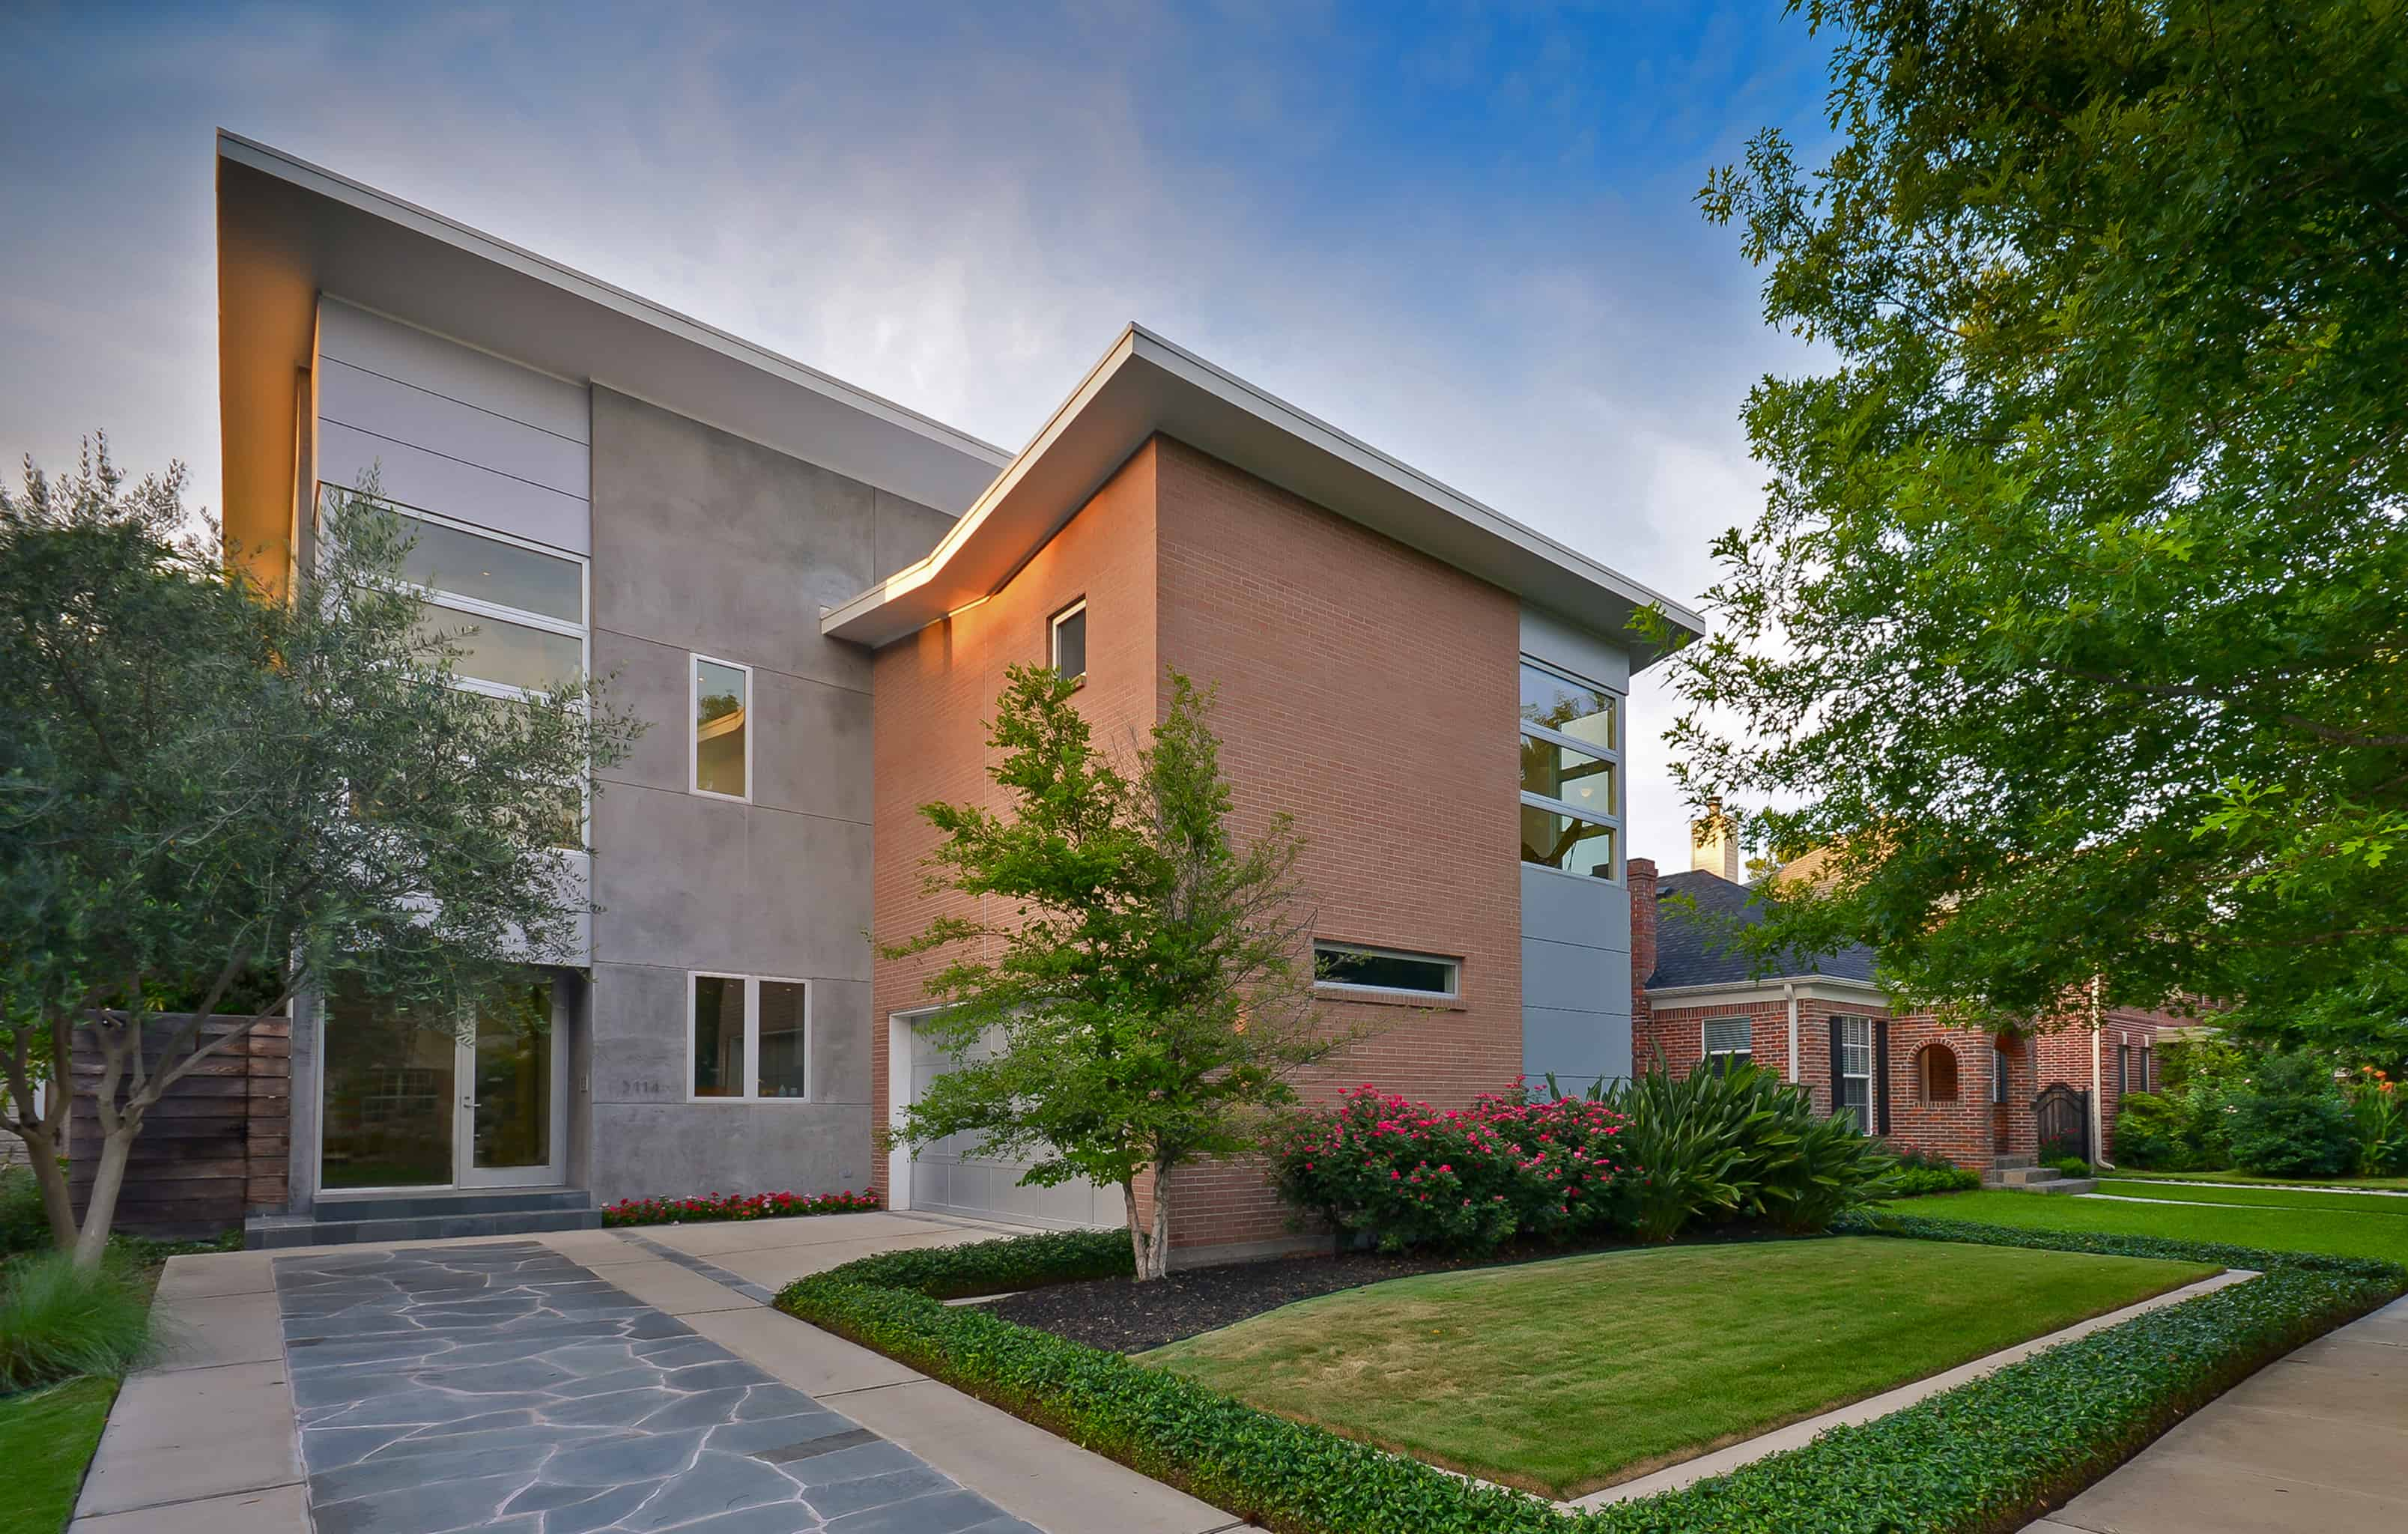 West University Modern Home